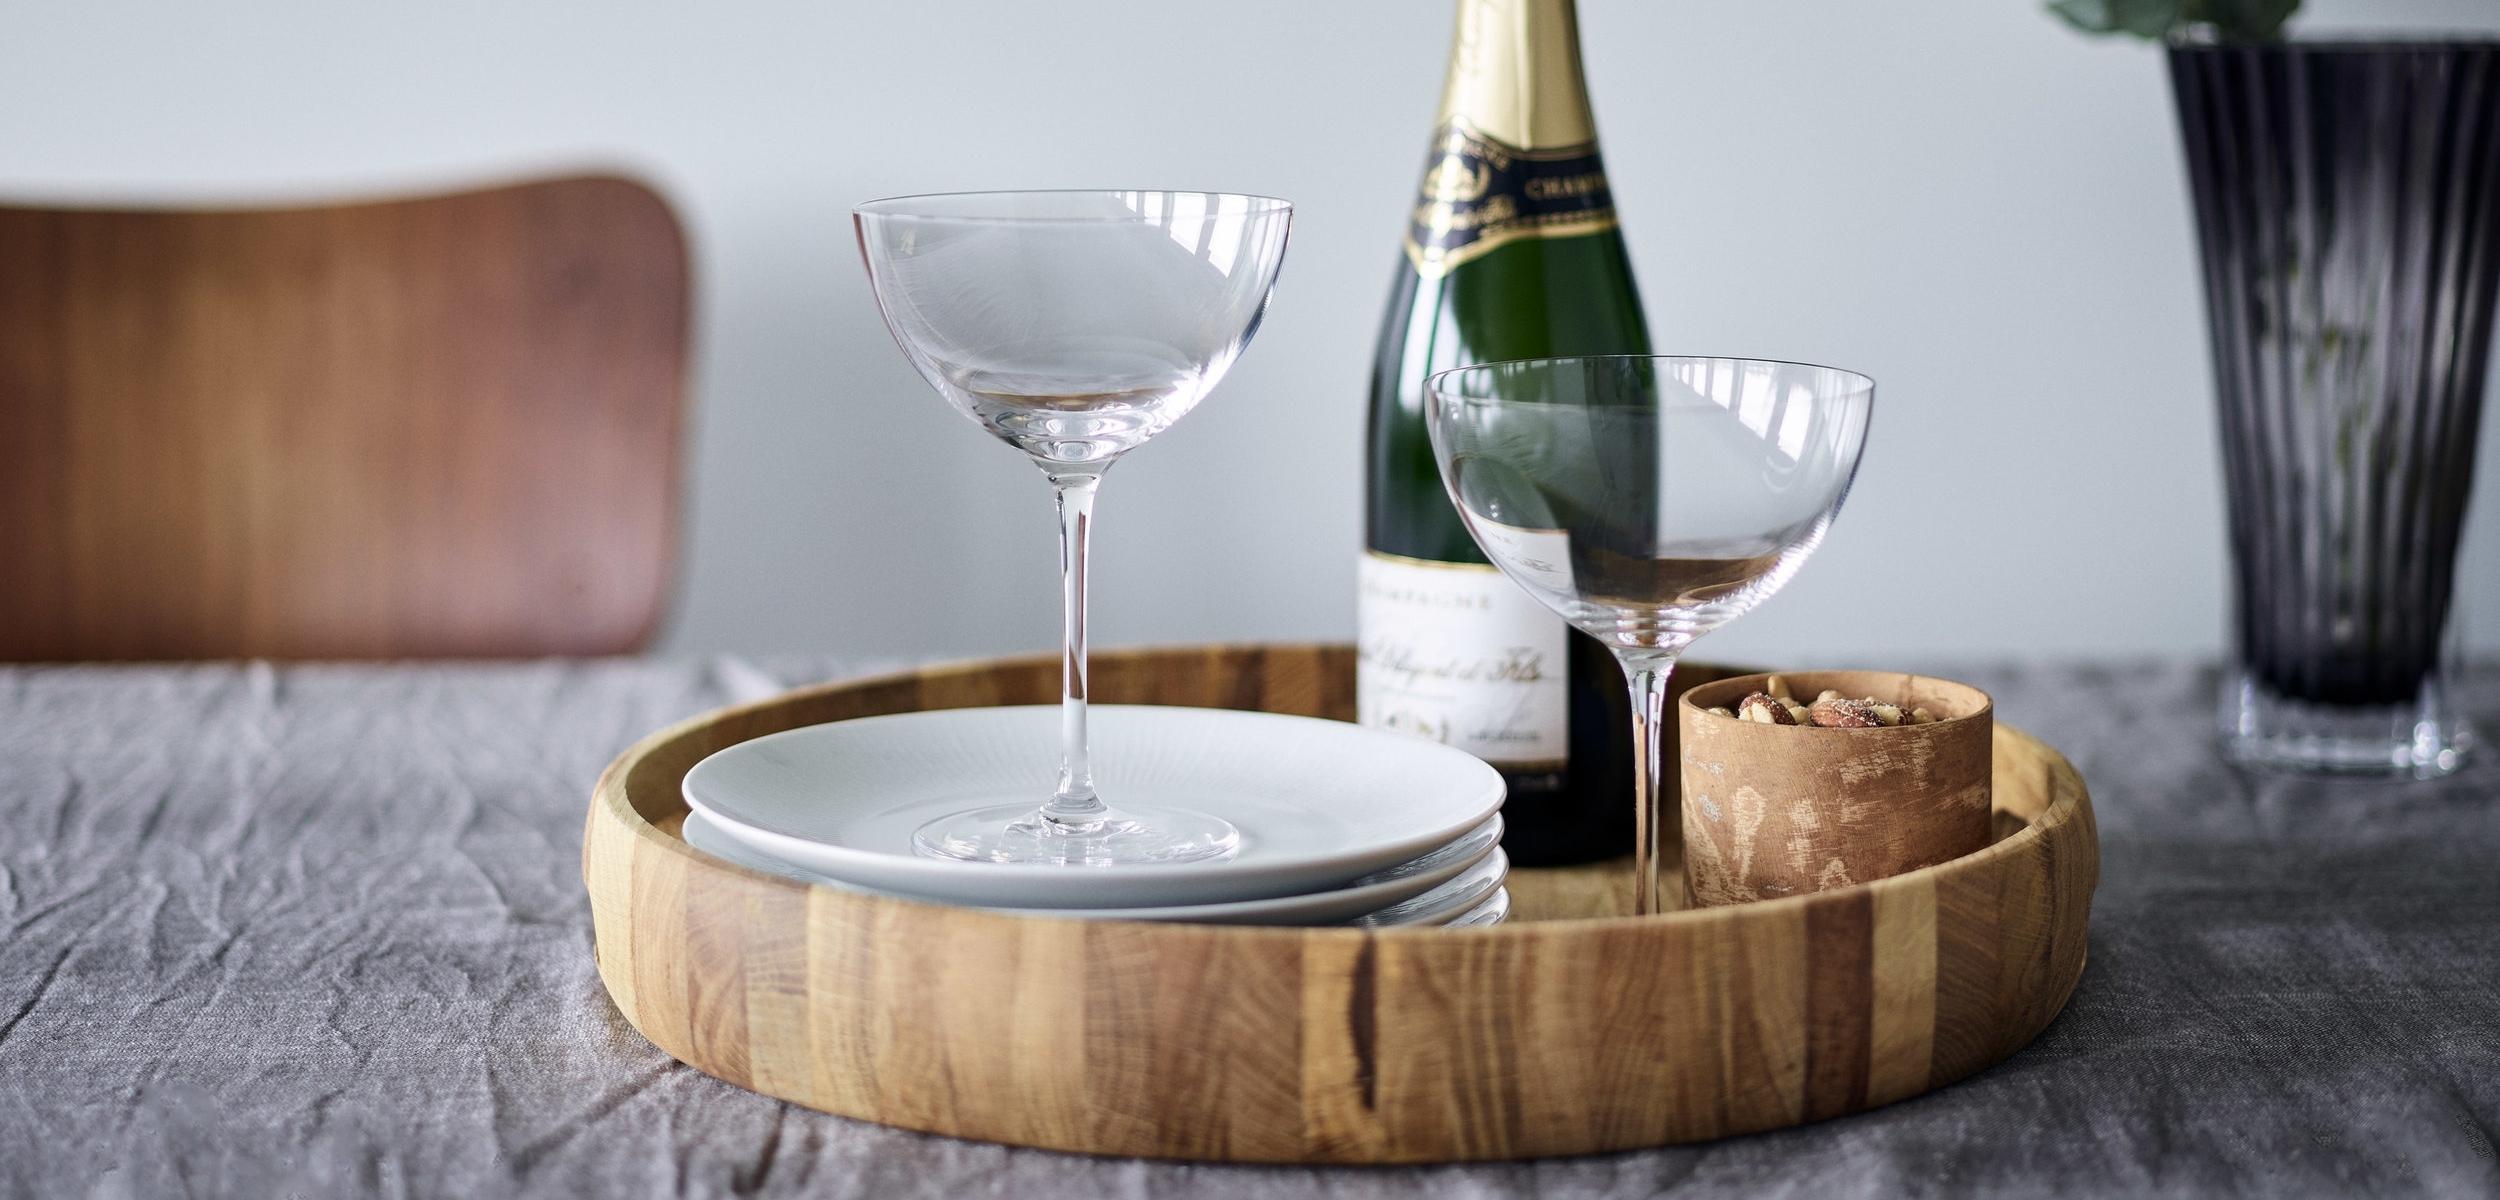 Encore champaign coupe.jpg